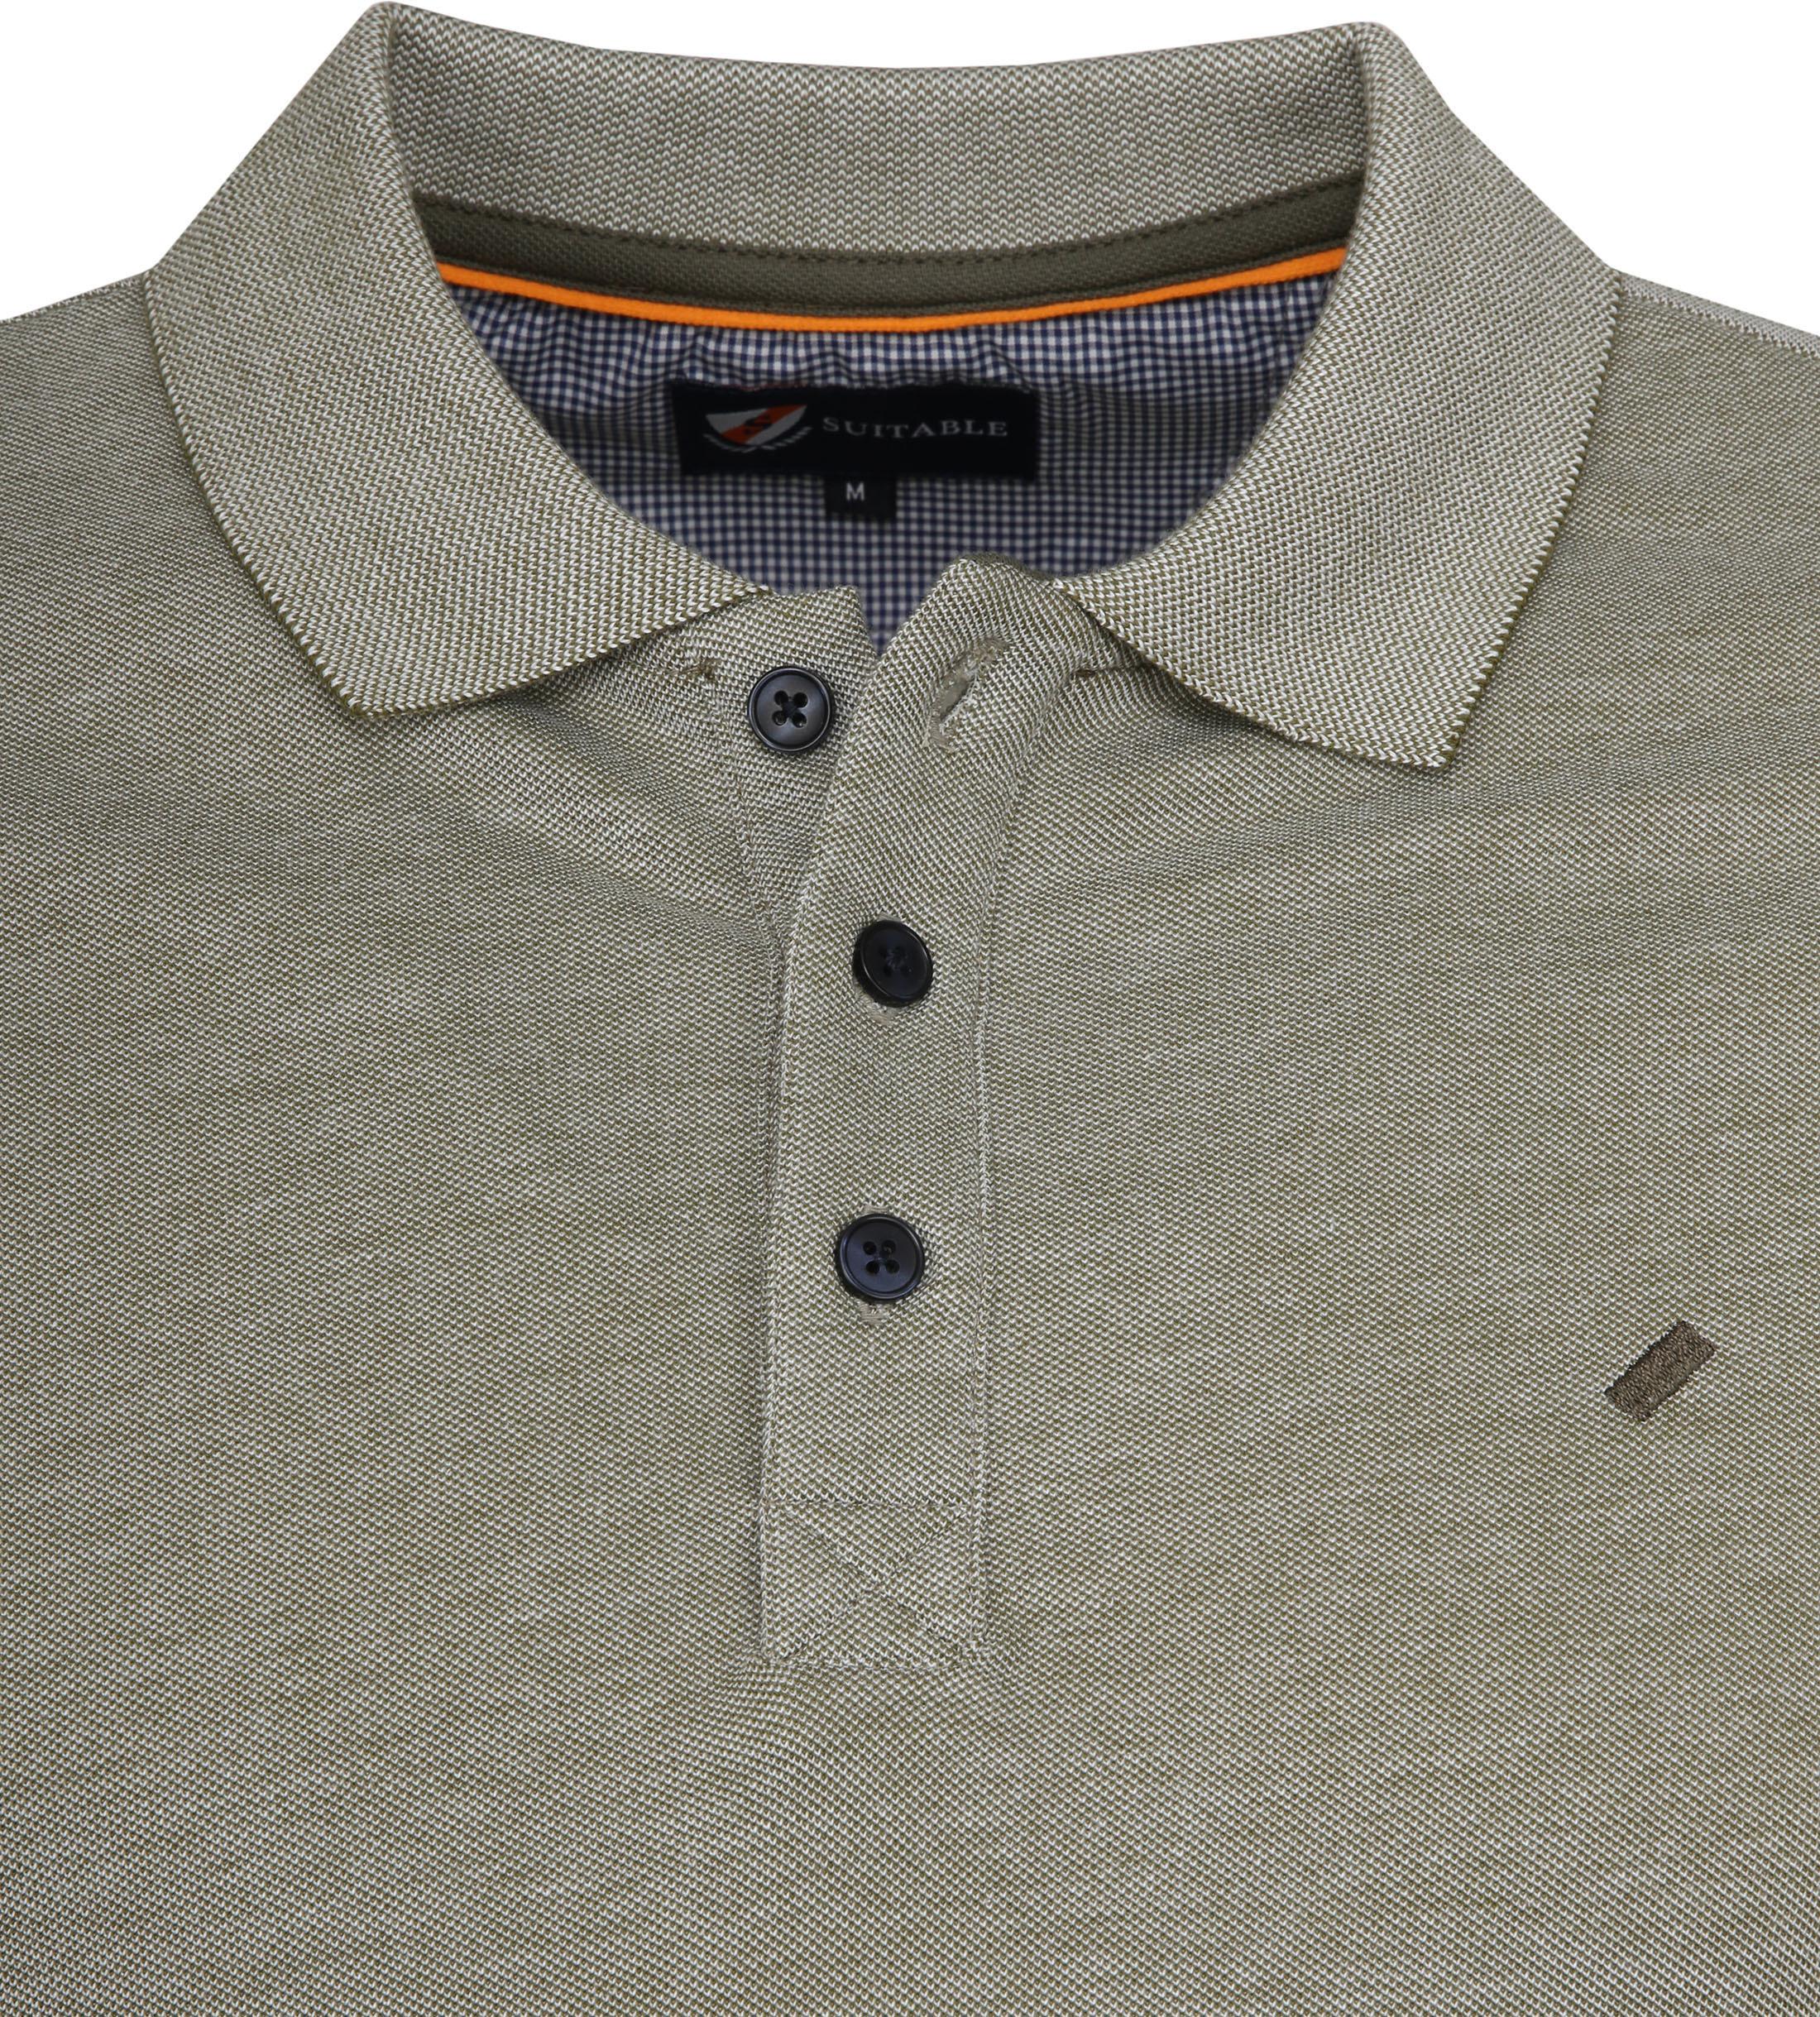 Suitable Oxford Poloshirt Green photo 1